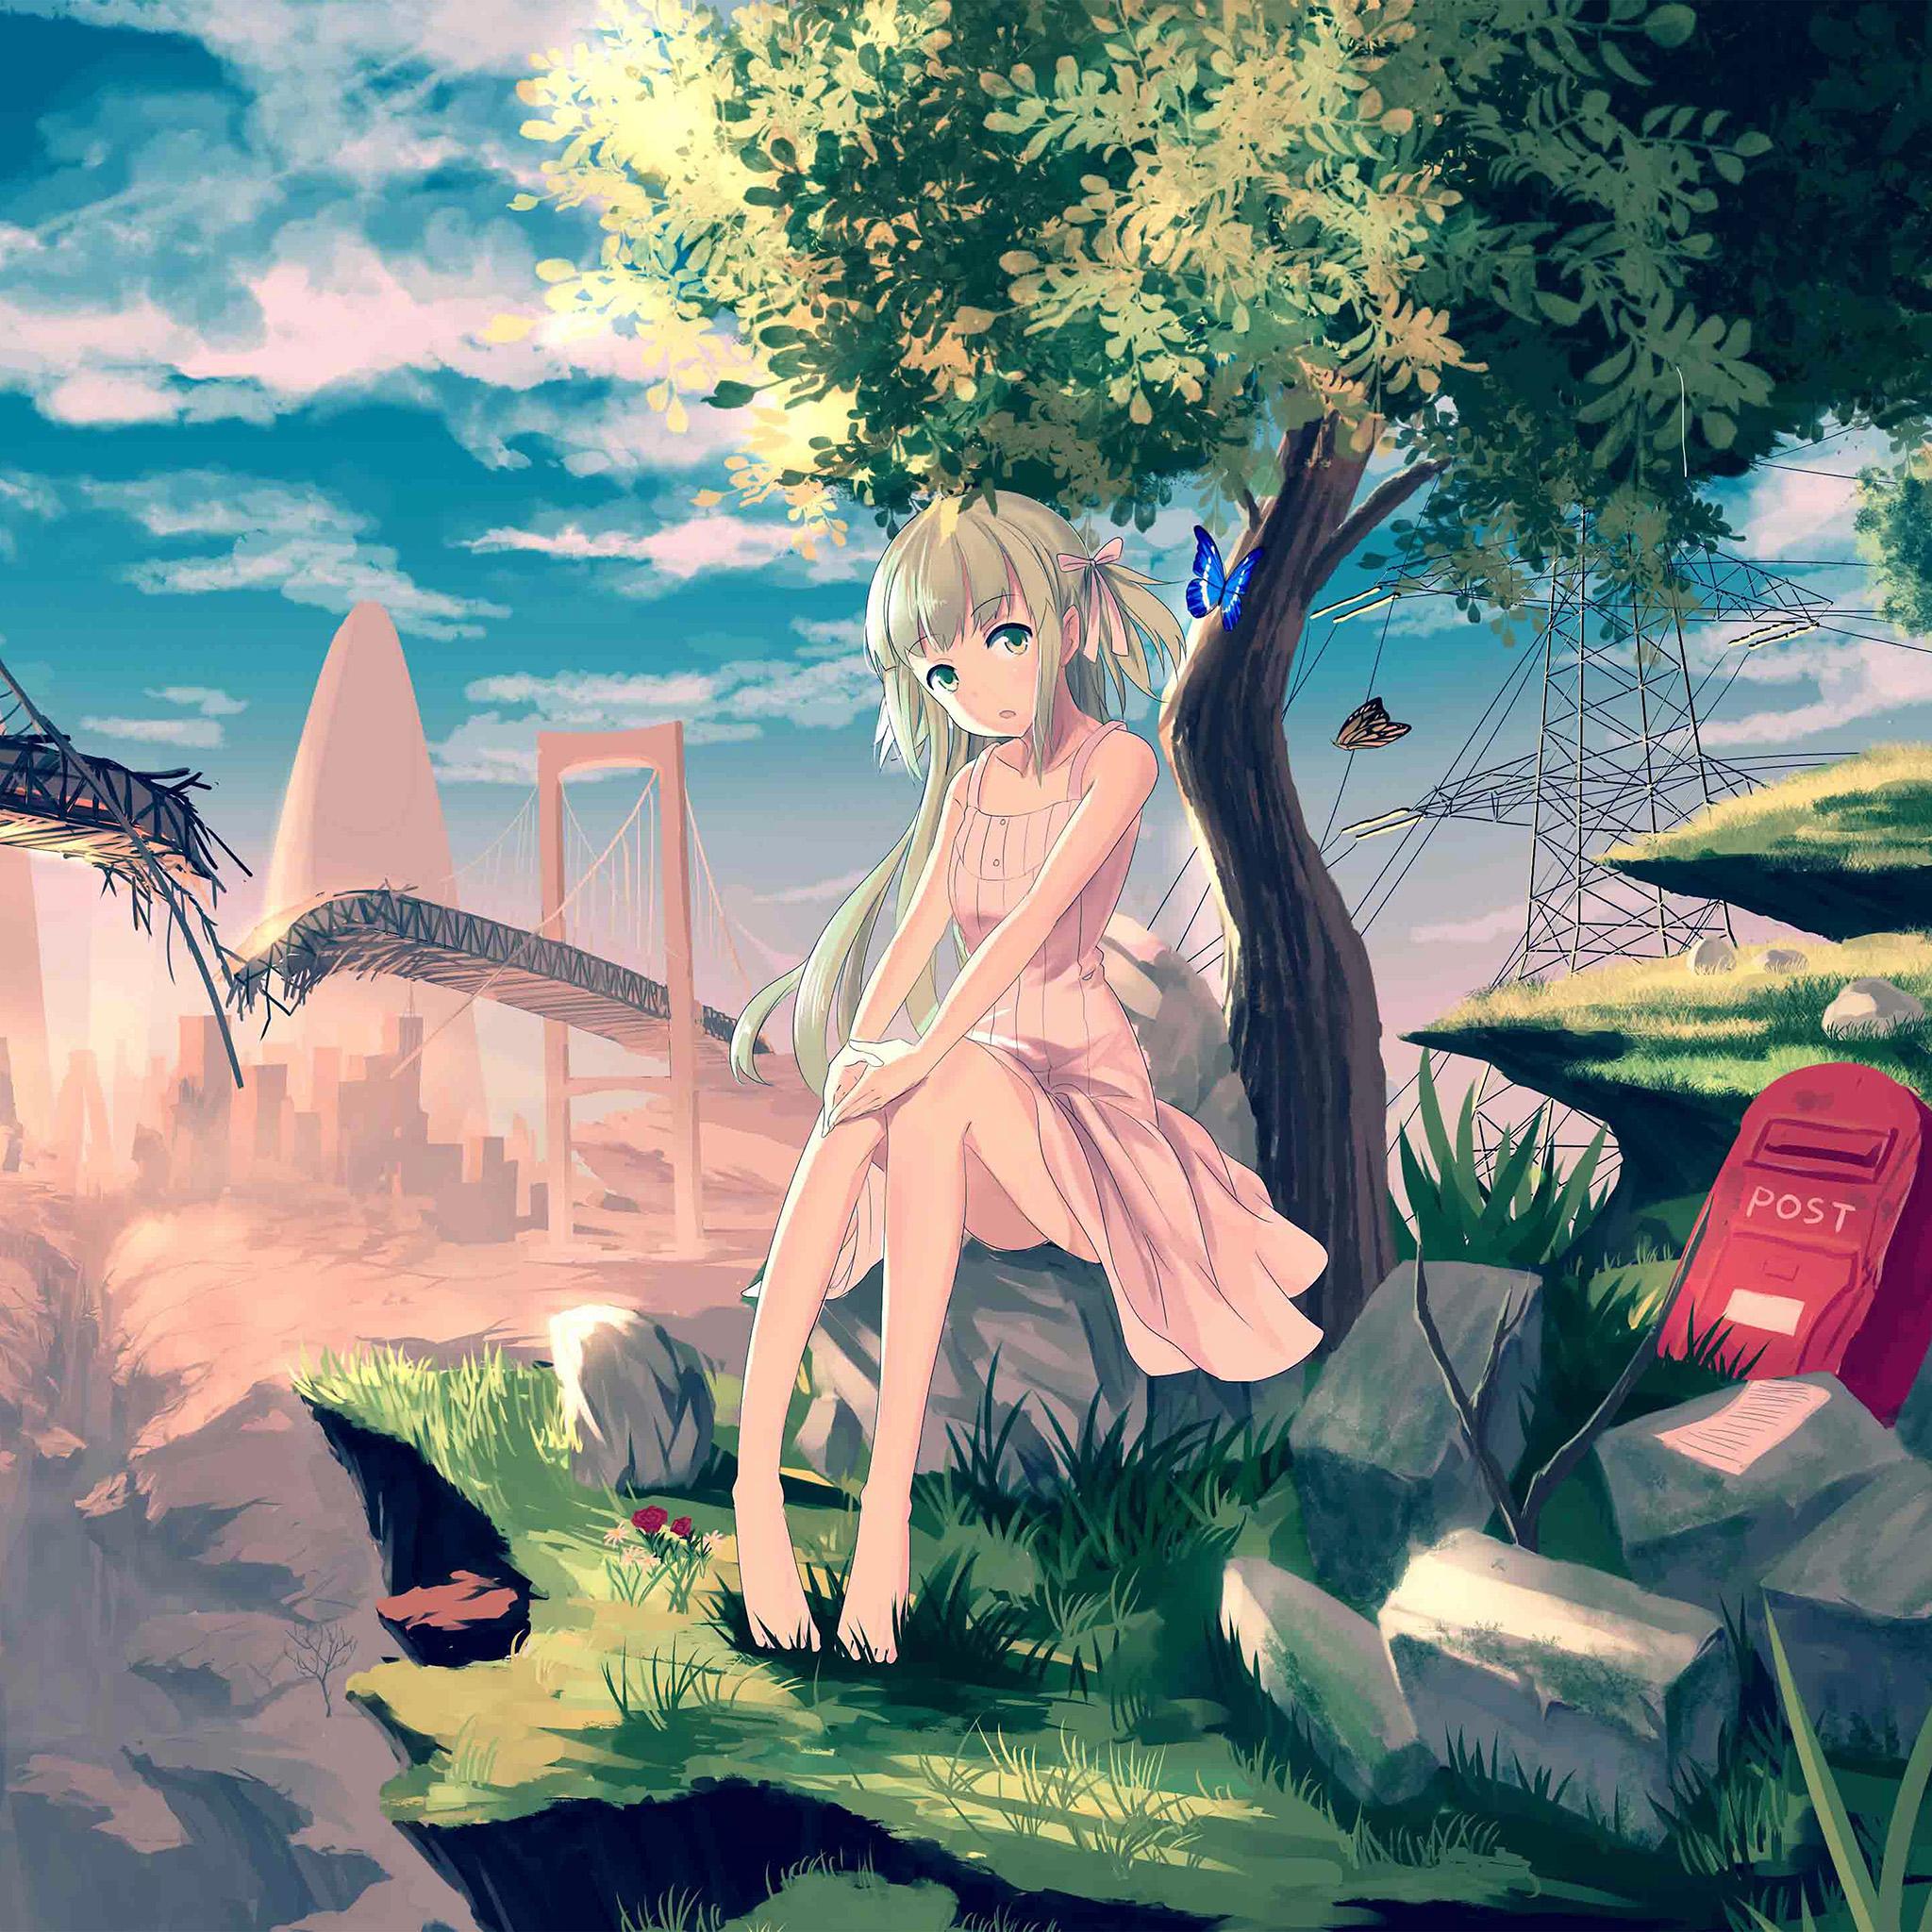 Cute Anime Wallpapers: Au48-cute-anime-girl-sunset-illustration-art